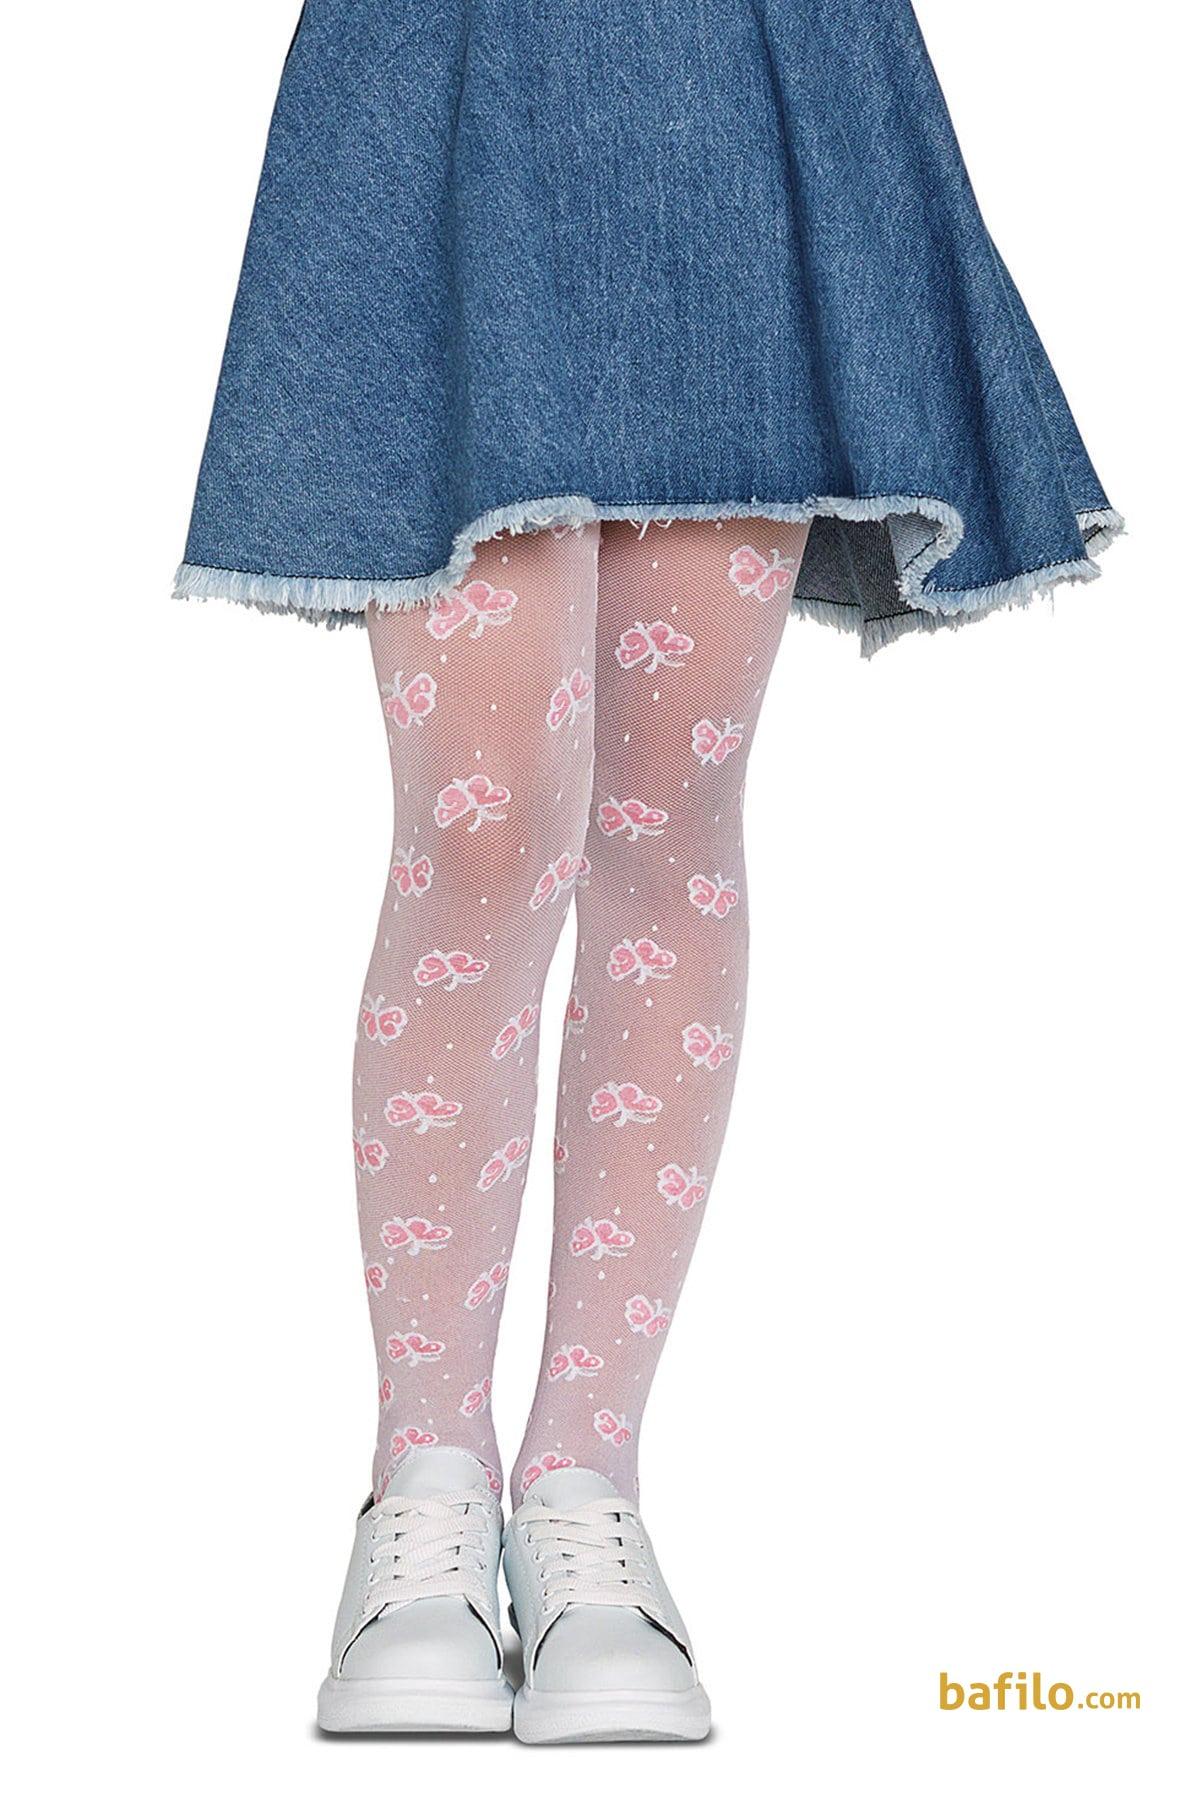 جوراب شلواری طرح دار دخترانه پنتی Wings سفید |